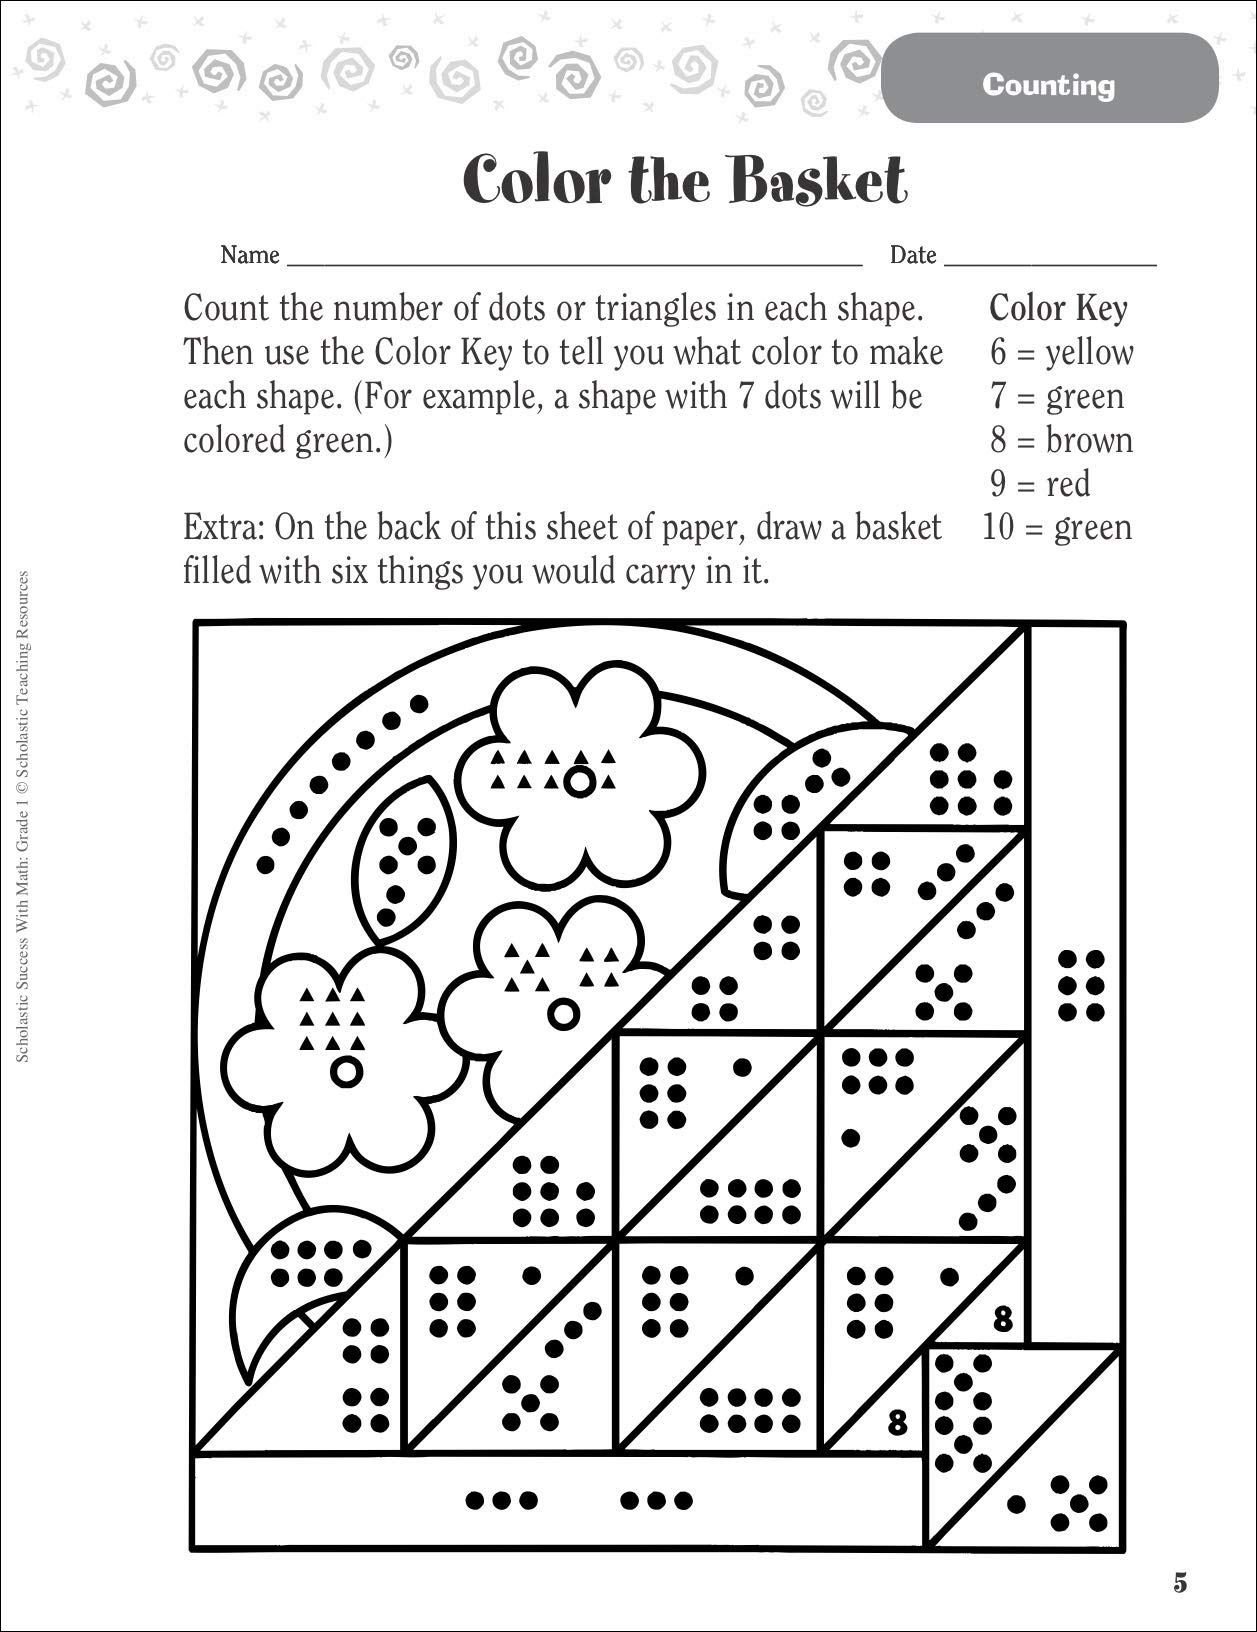 7th Grade Reading Comprehension Pdf